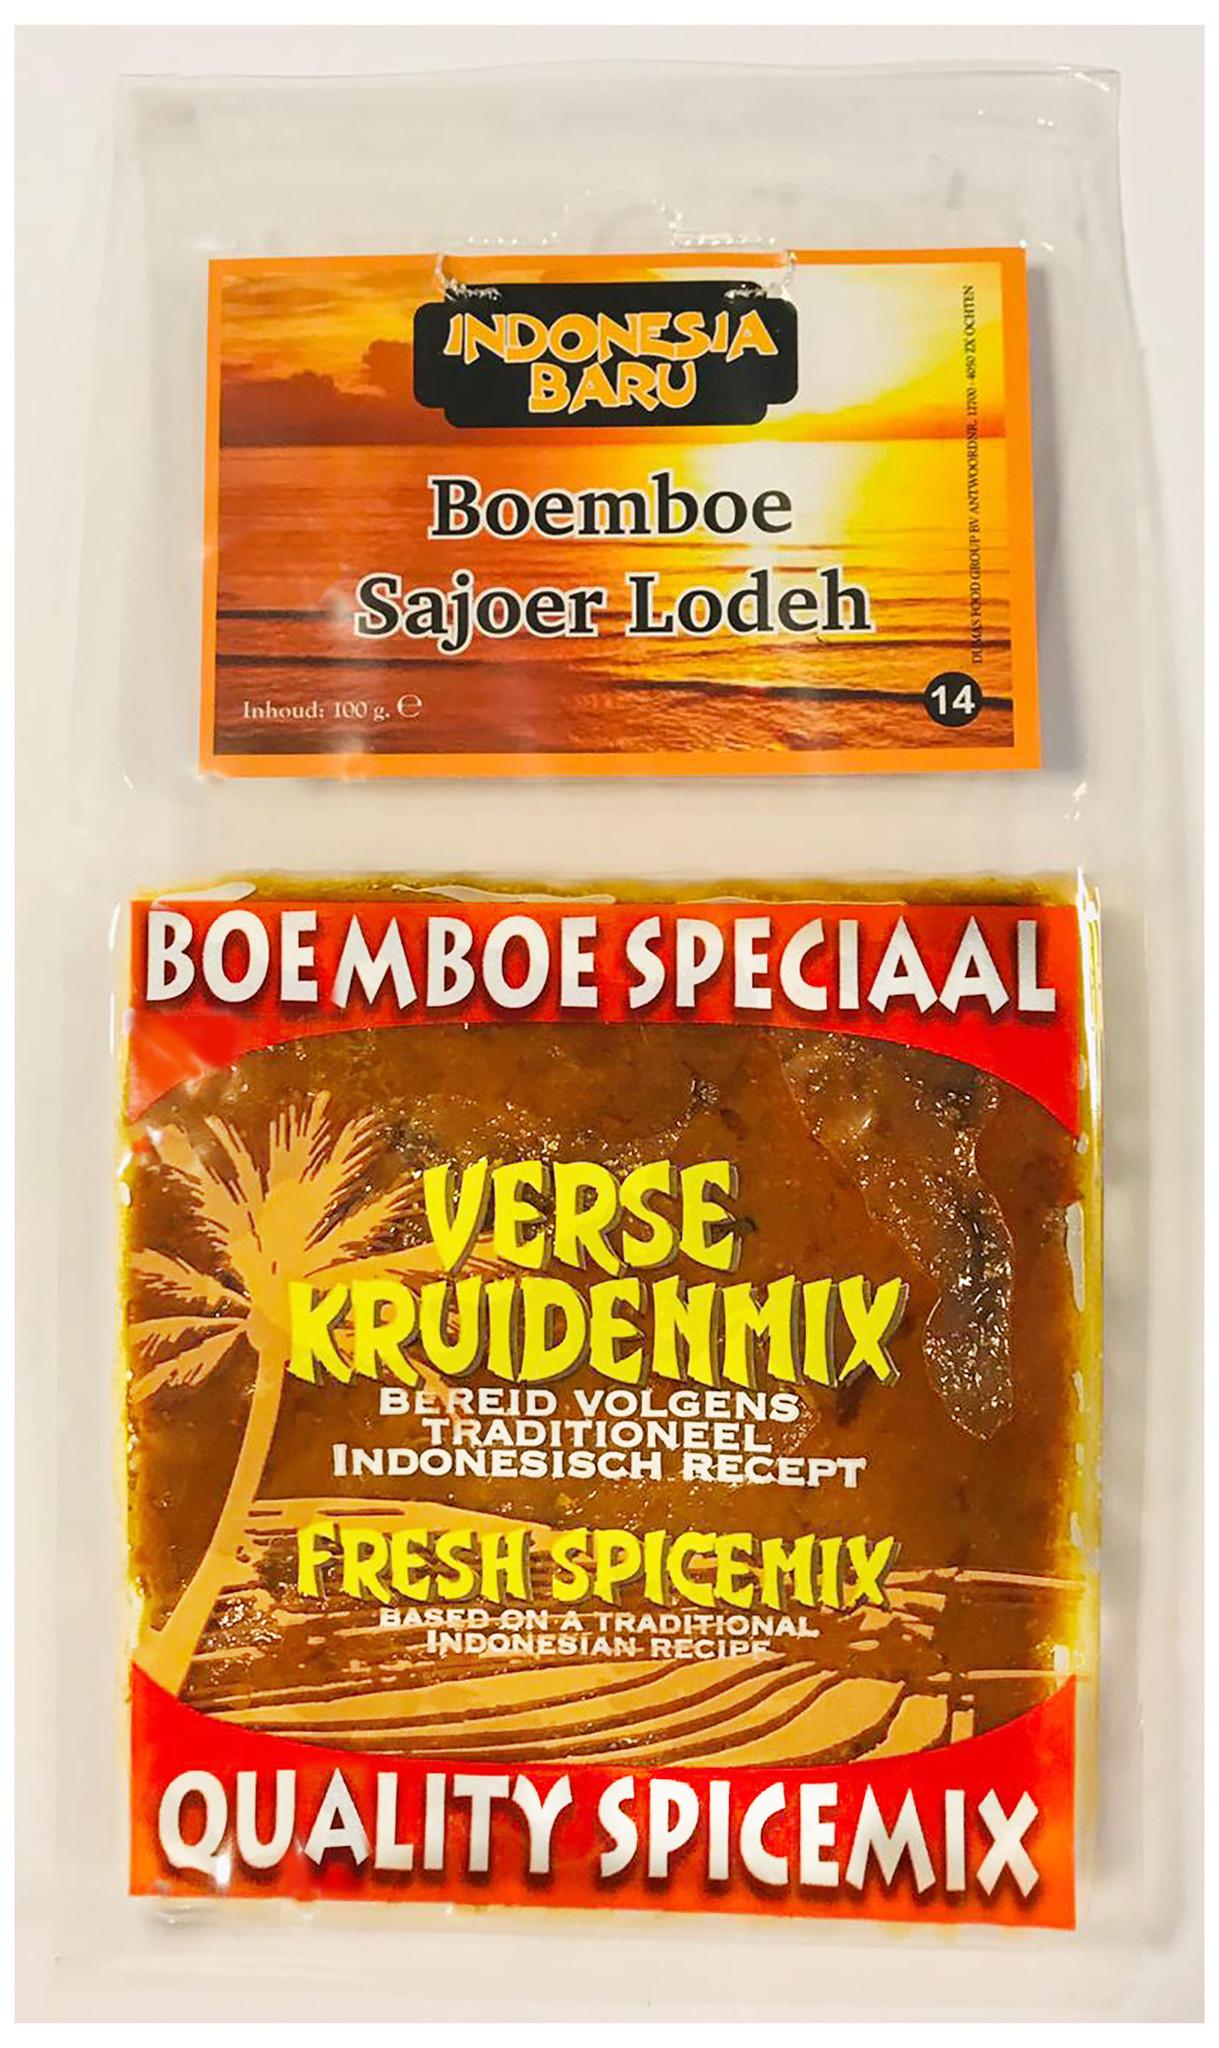 Boemboe Sajoer Lodeh